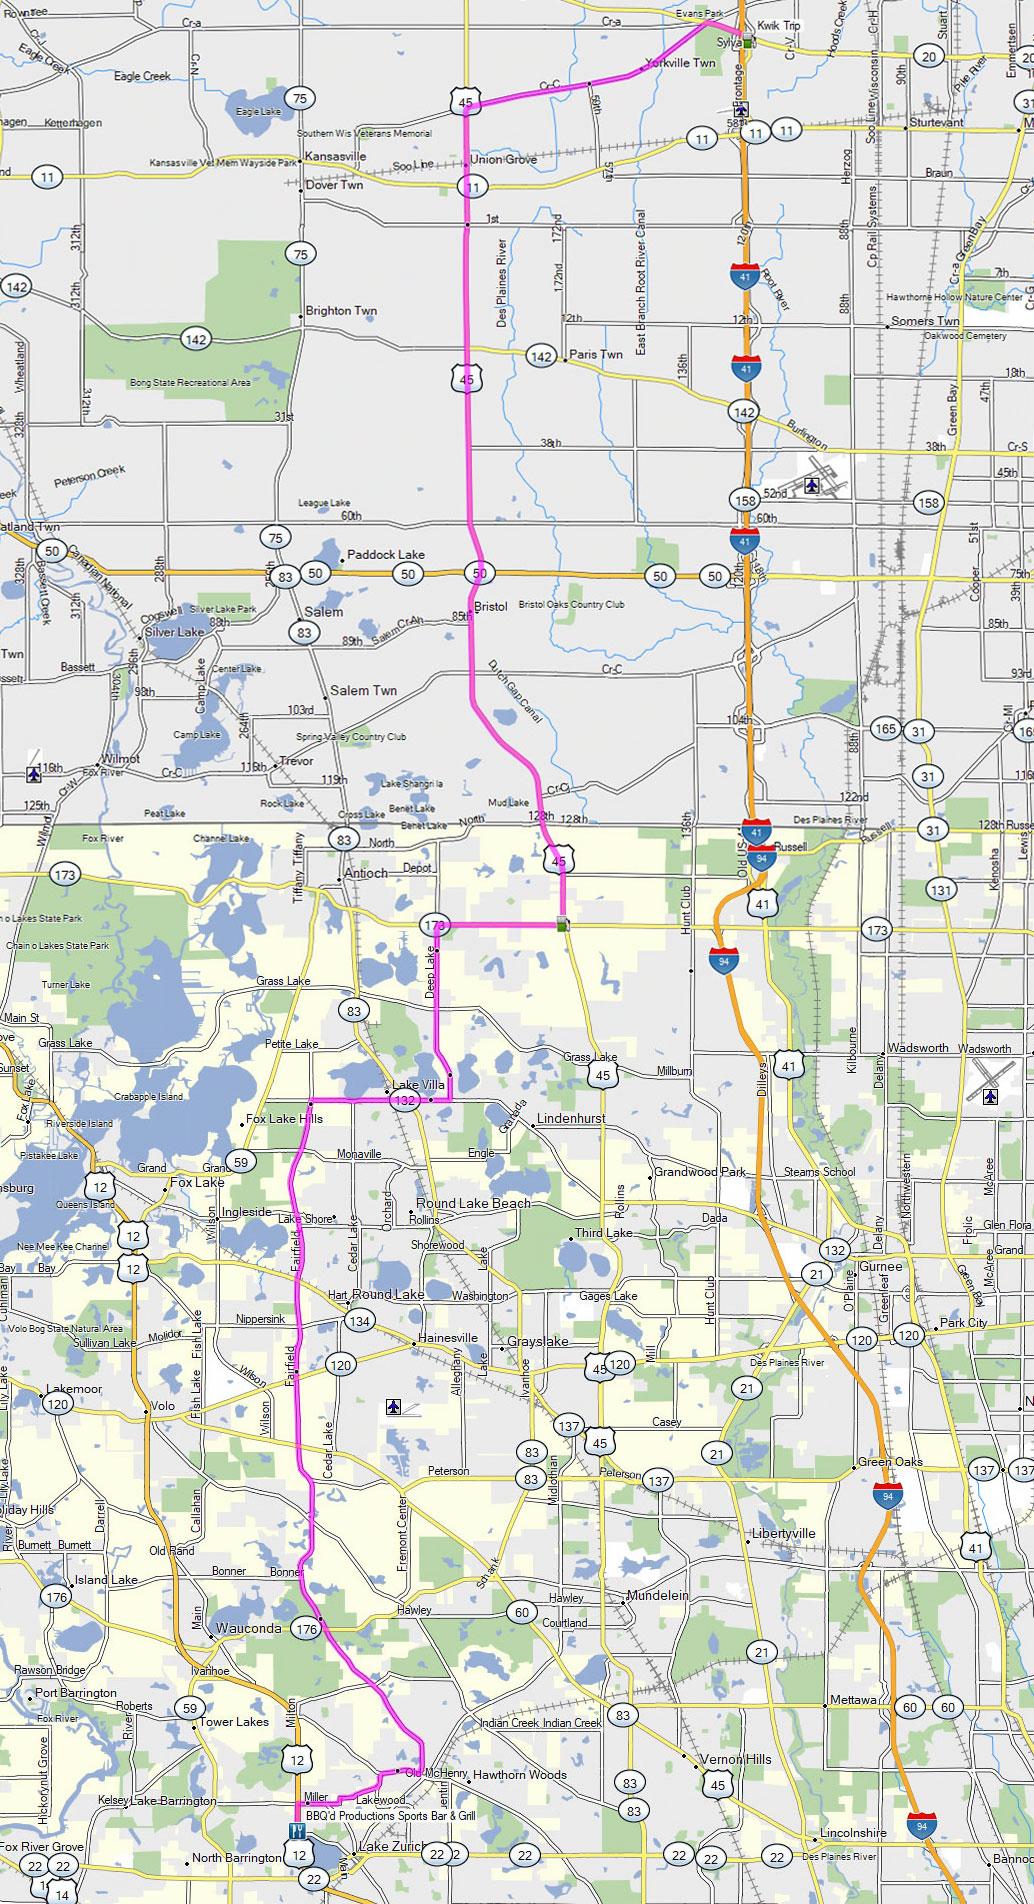 BBQ_Productions_Map.jpg